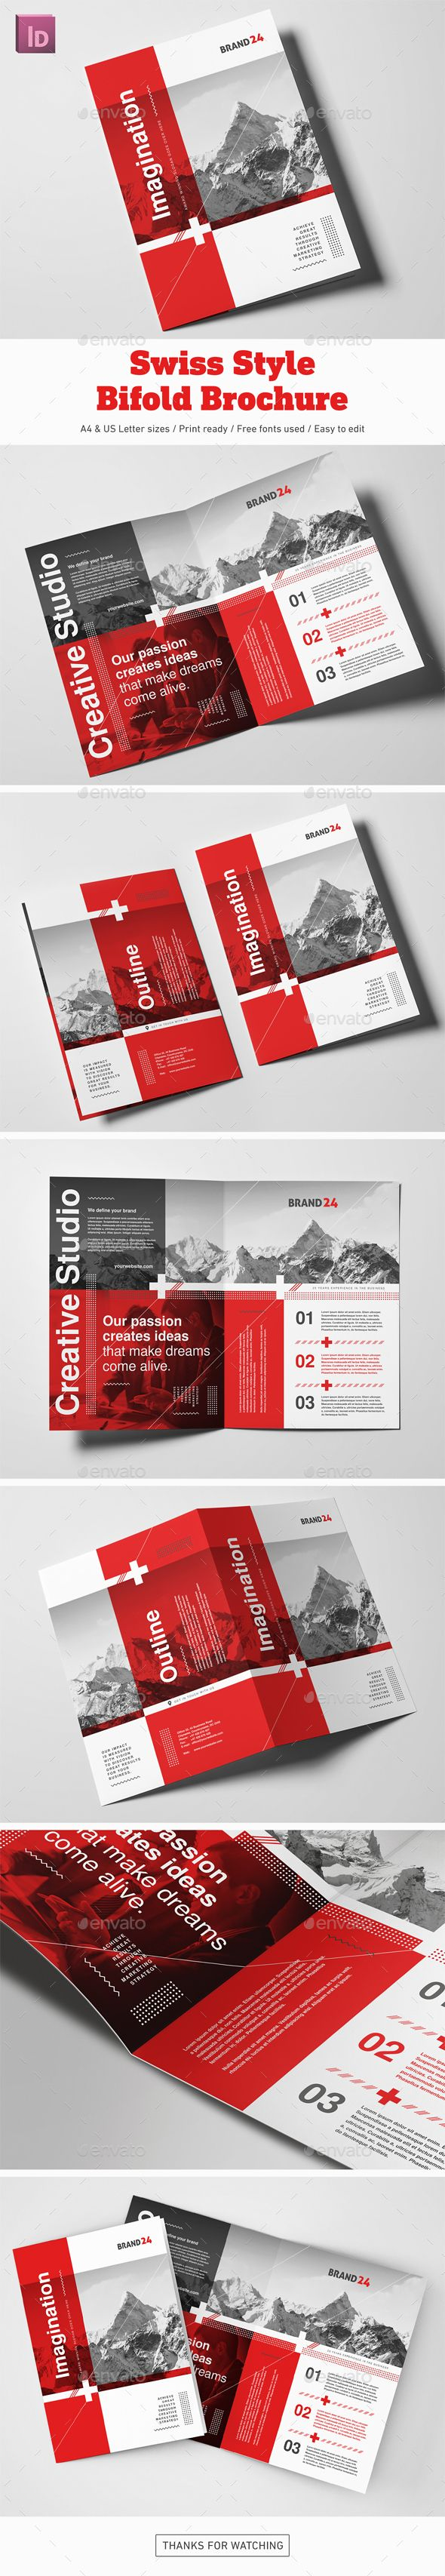 Swiss Style Bifold Brochure | Folletos, Diseño editorial y Catálogo